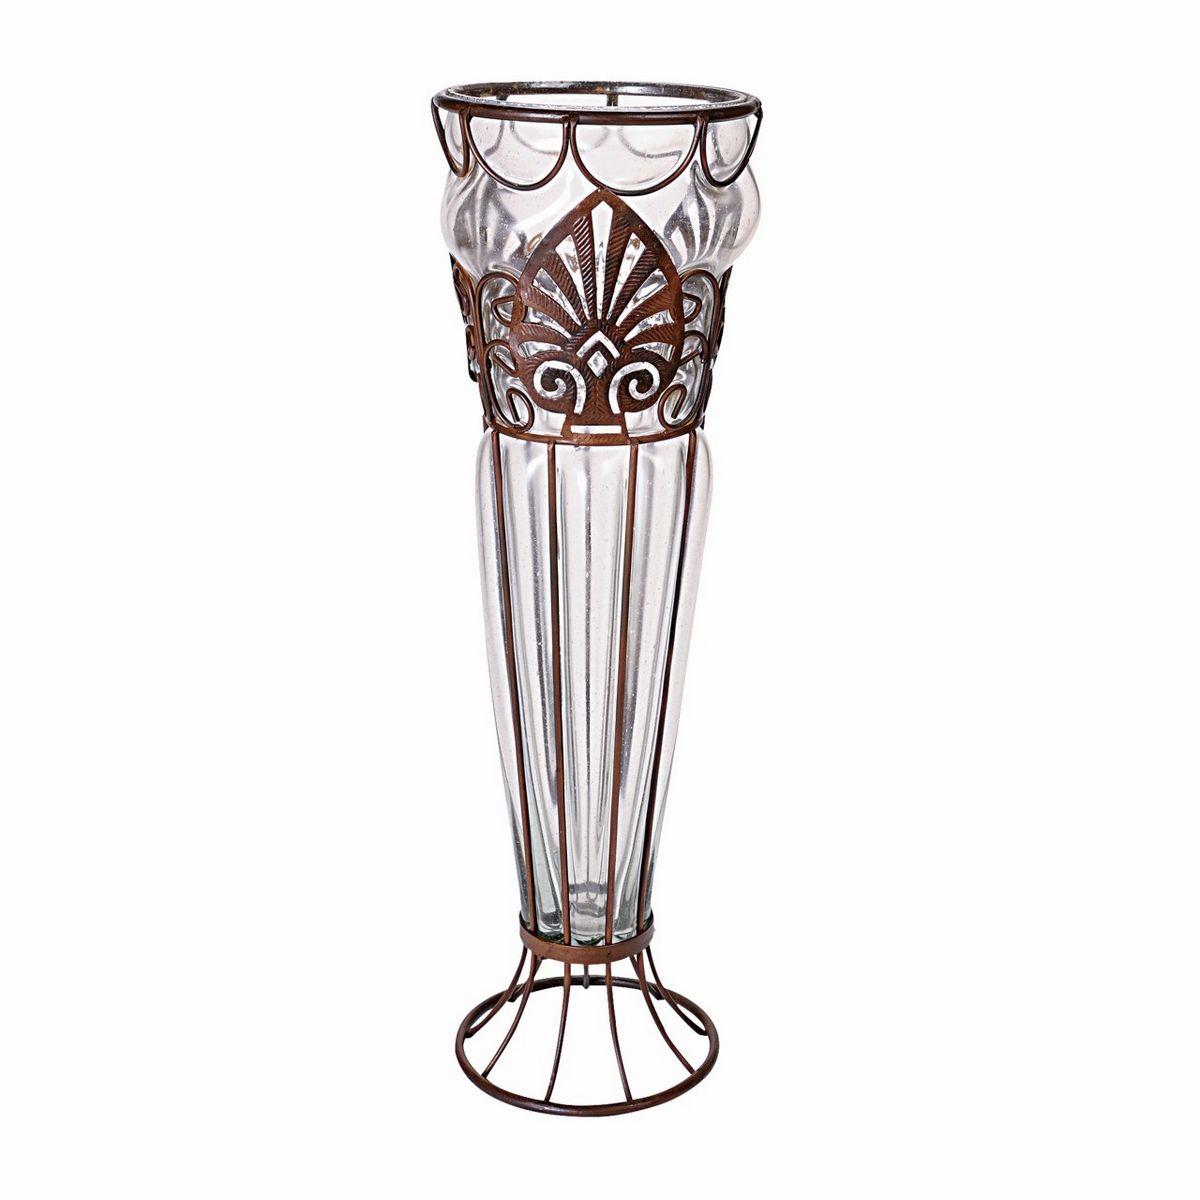 MetalglassVaseトールリーフ/CT0PGC17【01】【取寄】